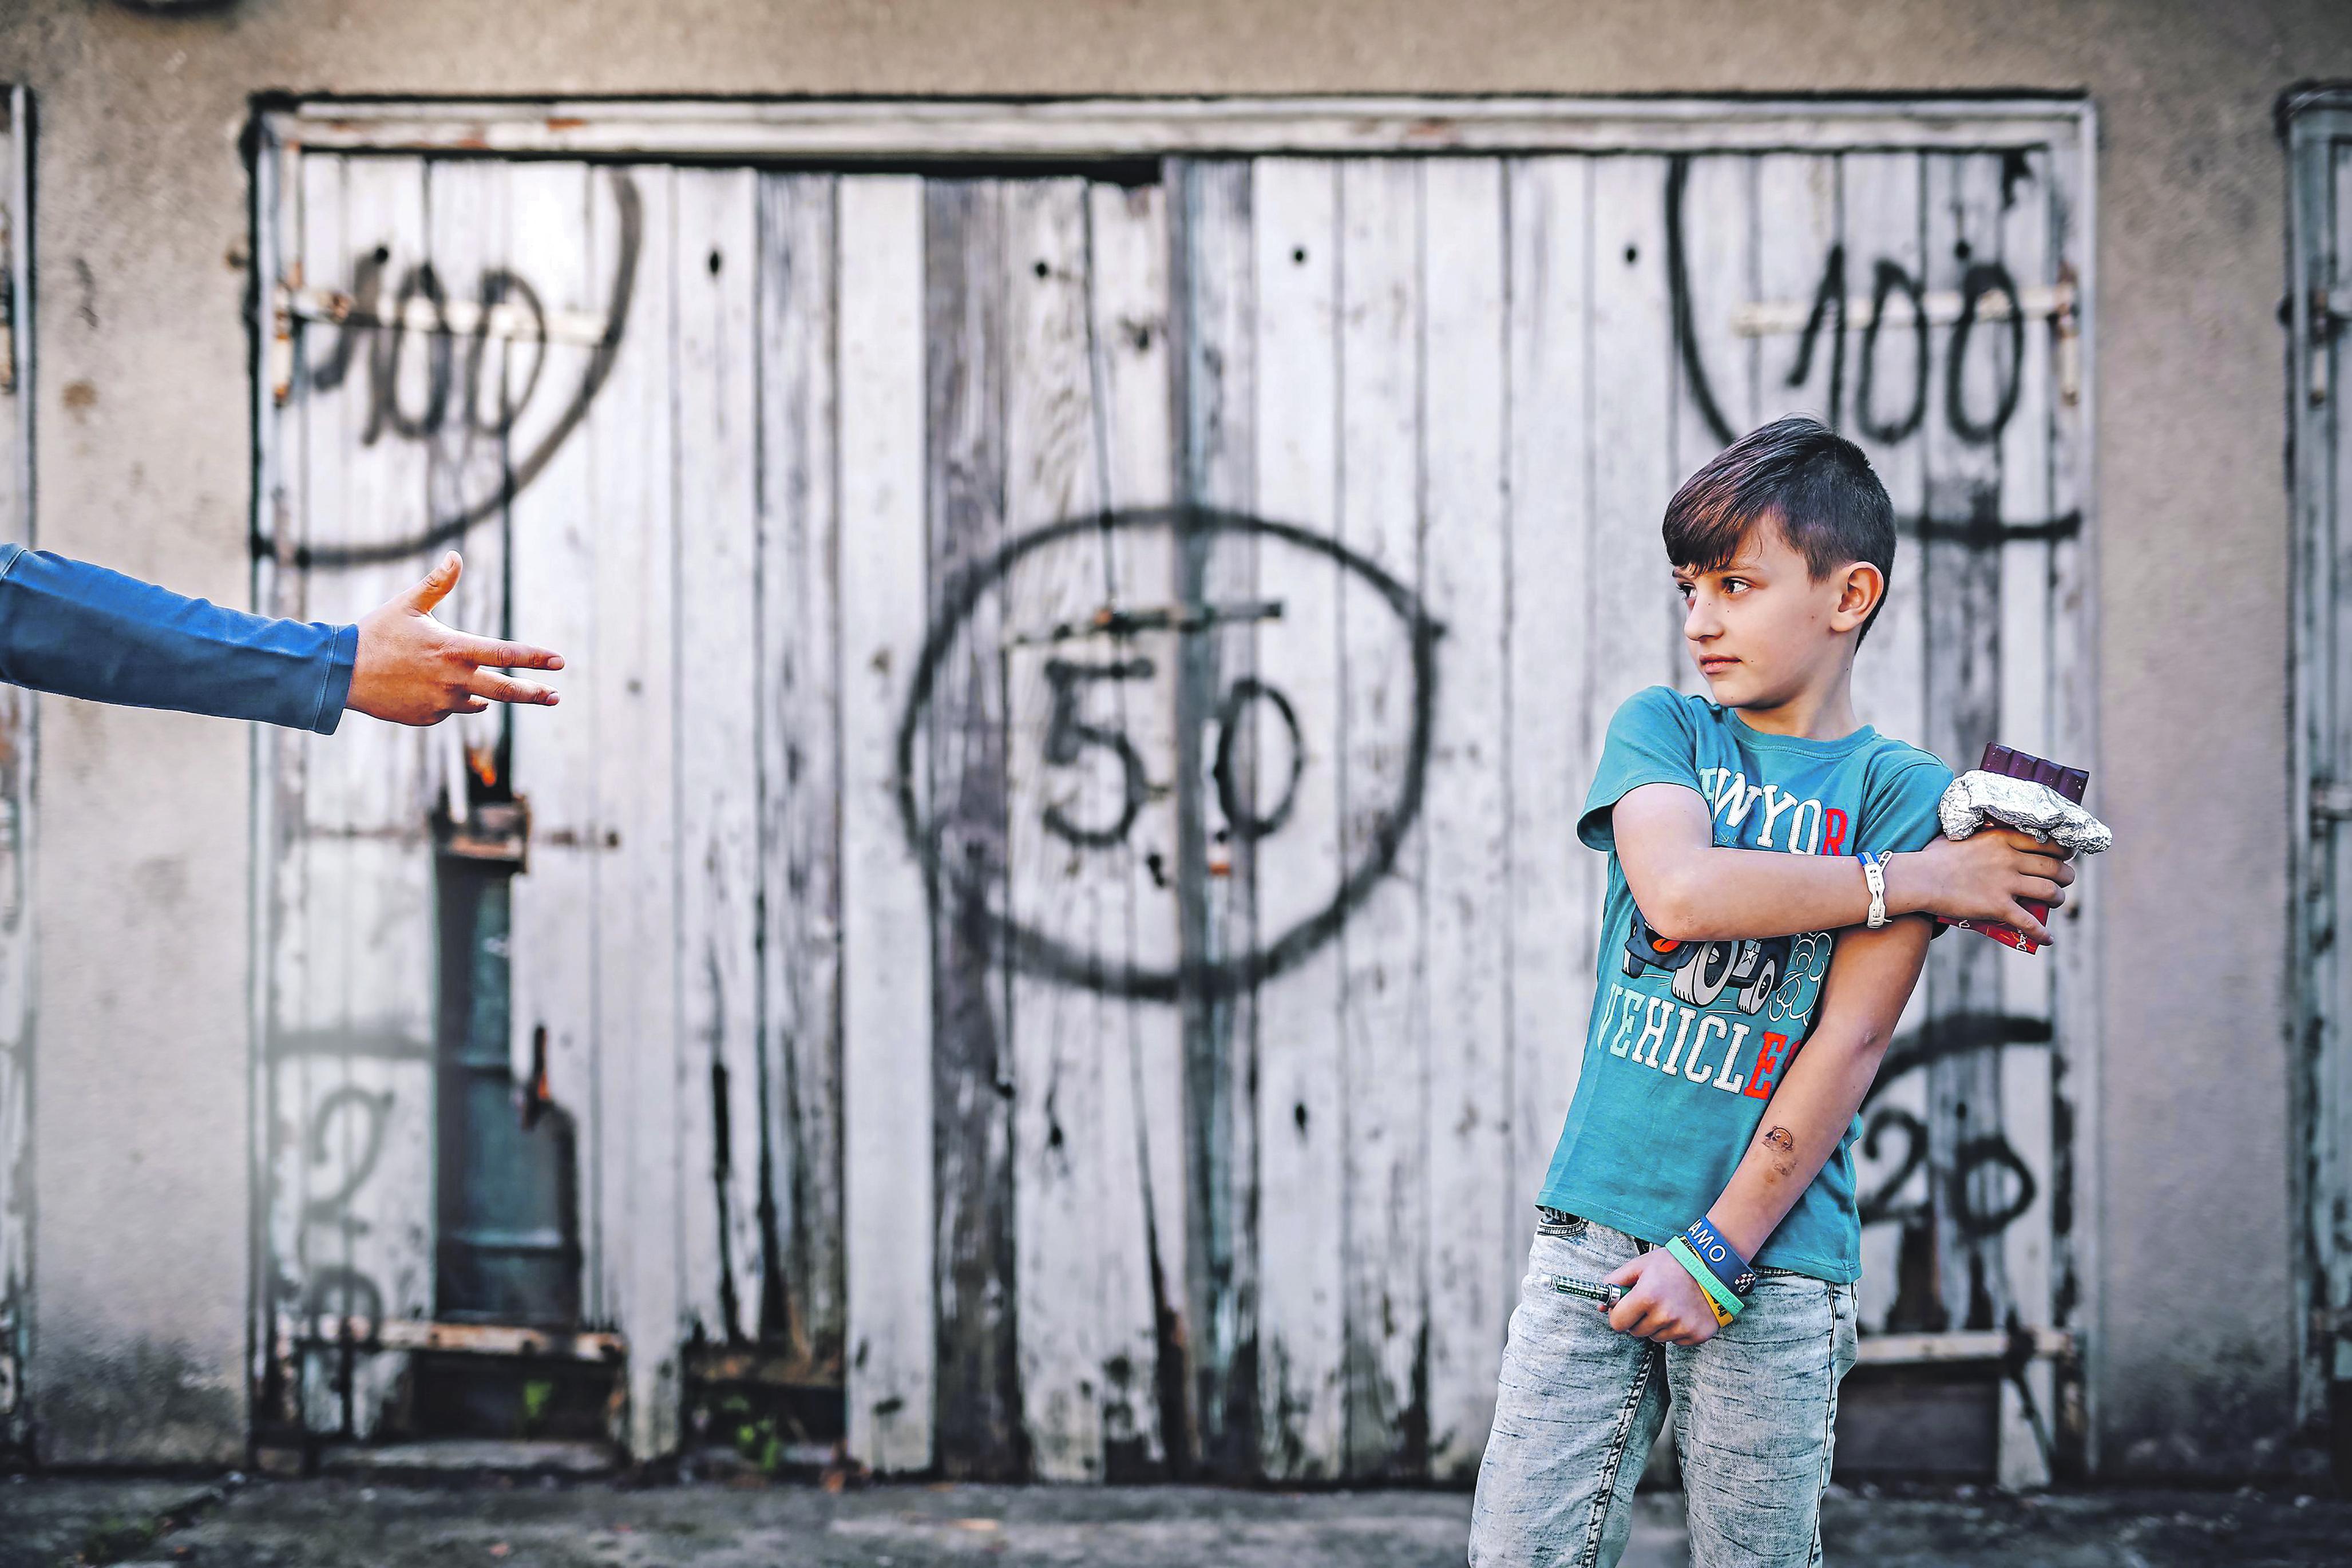 Novska, 201017. Patrik Krmpotic ucenik osnovne skole Novska boluje od dijabetesa.Njegovi roditelji Josipa i Dominik se bore za njegovu zdravstvenu sigurnost u skoli. Na fotografiji Patrik Krmpotic. Foto: Danijel Soldo / CROPIX